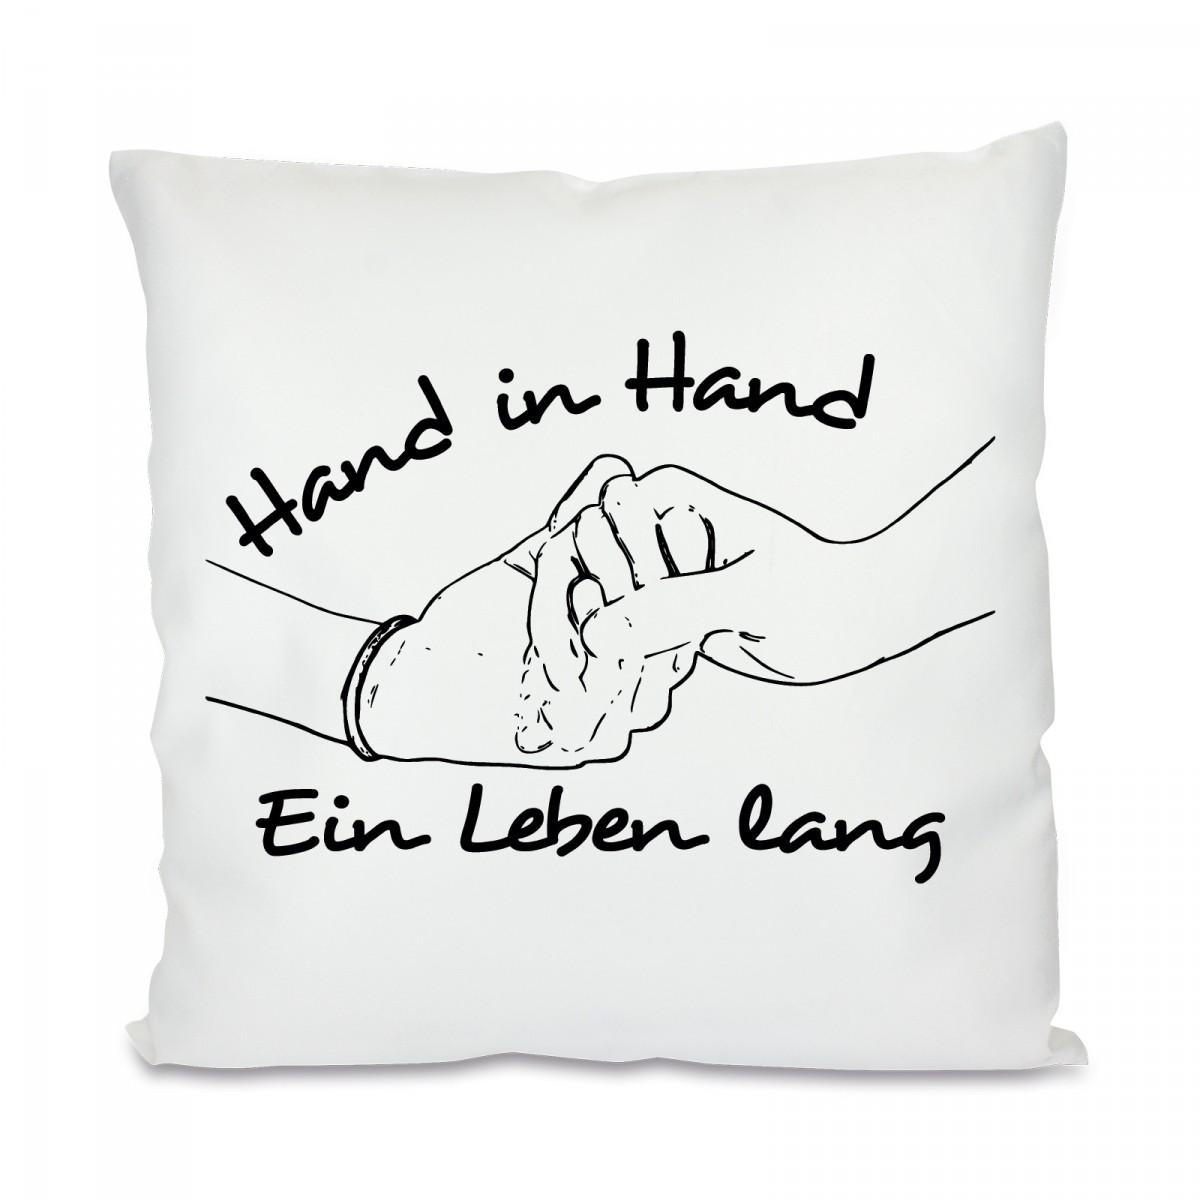 kissen mit motiv modell hand in hand. Black Bedroom Furniture Sets. Home Design Ideas